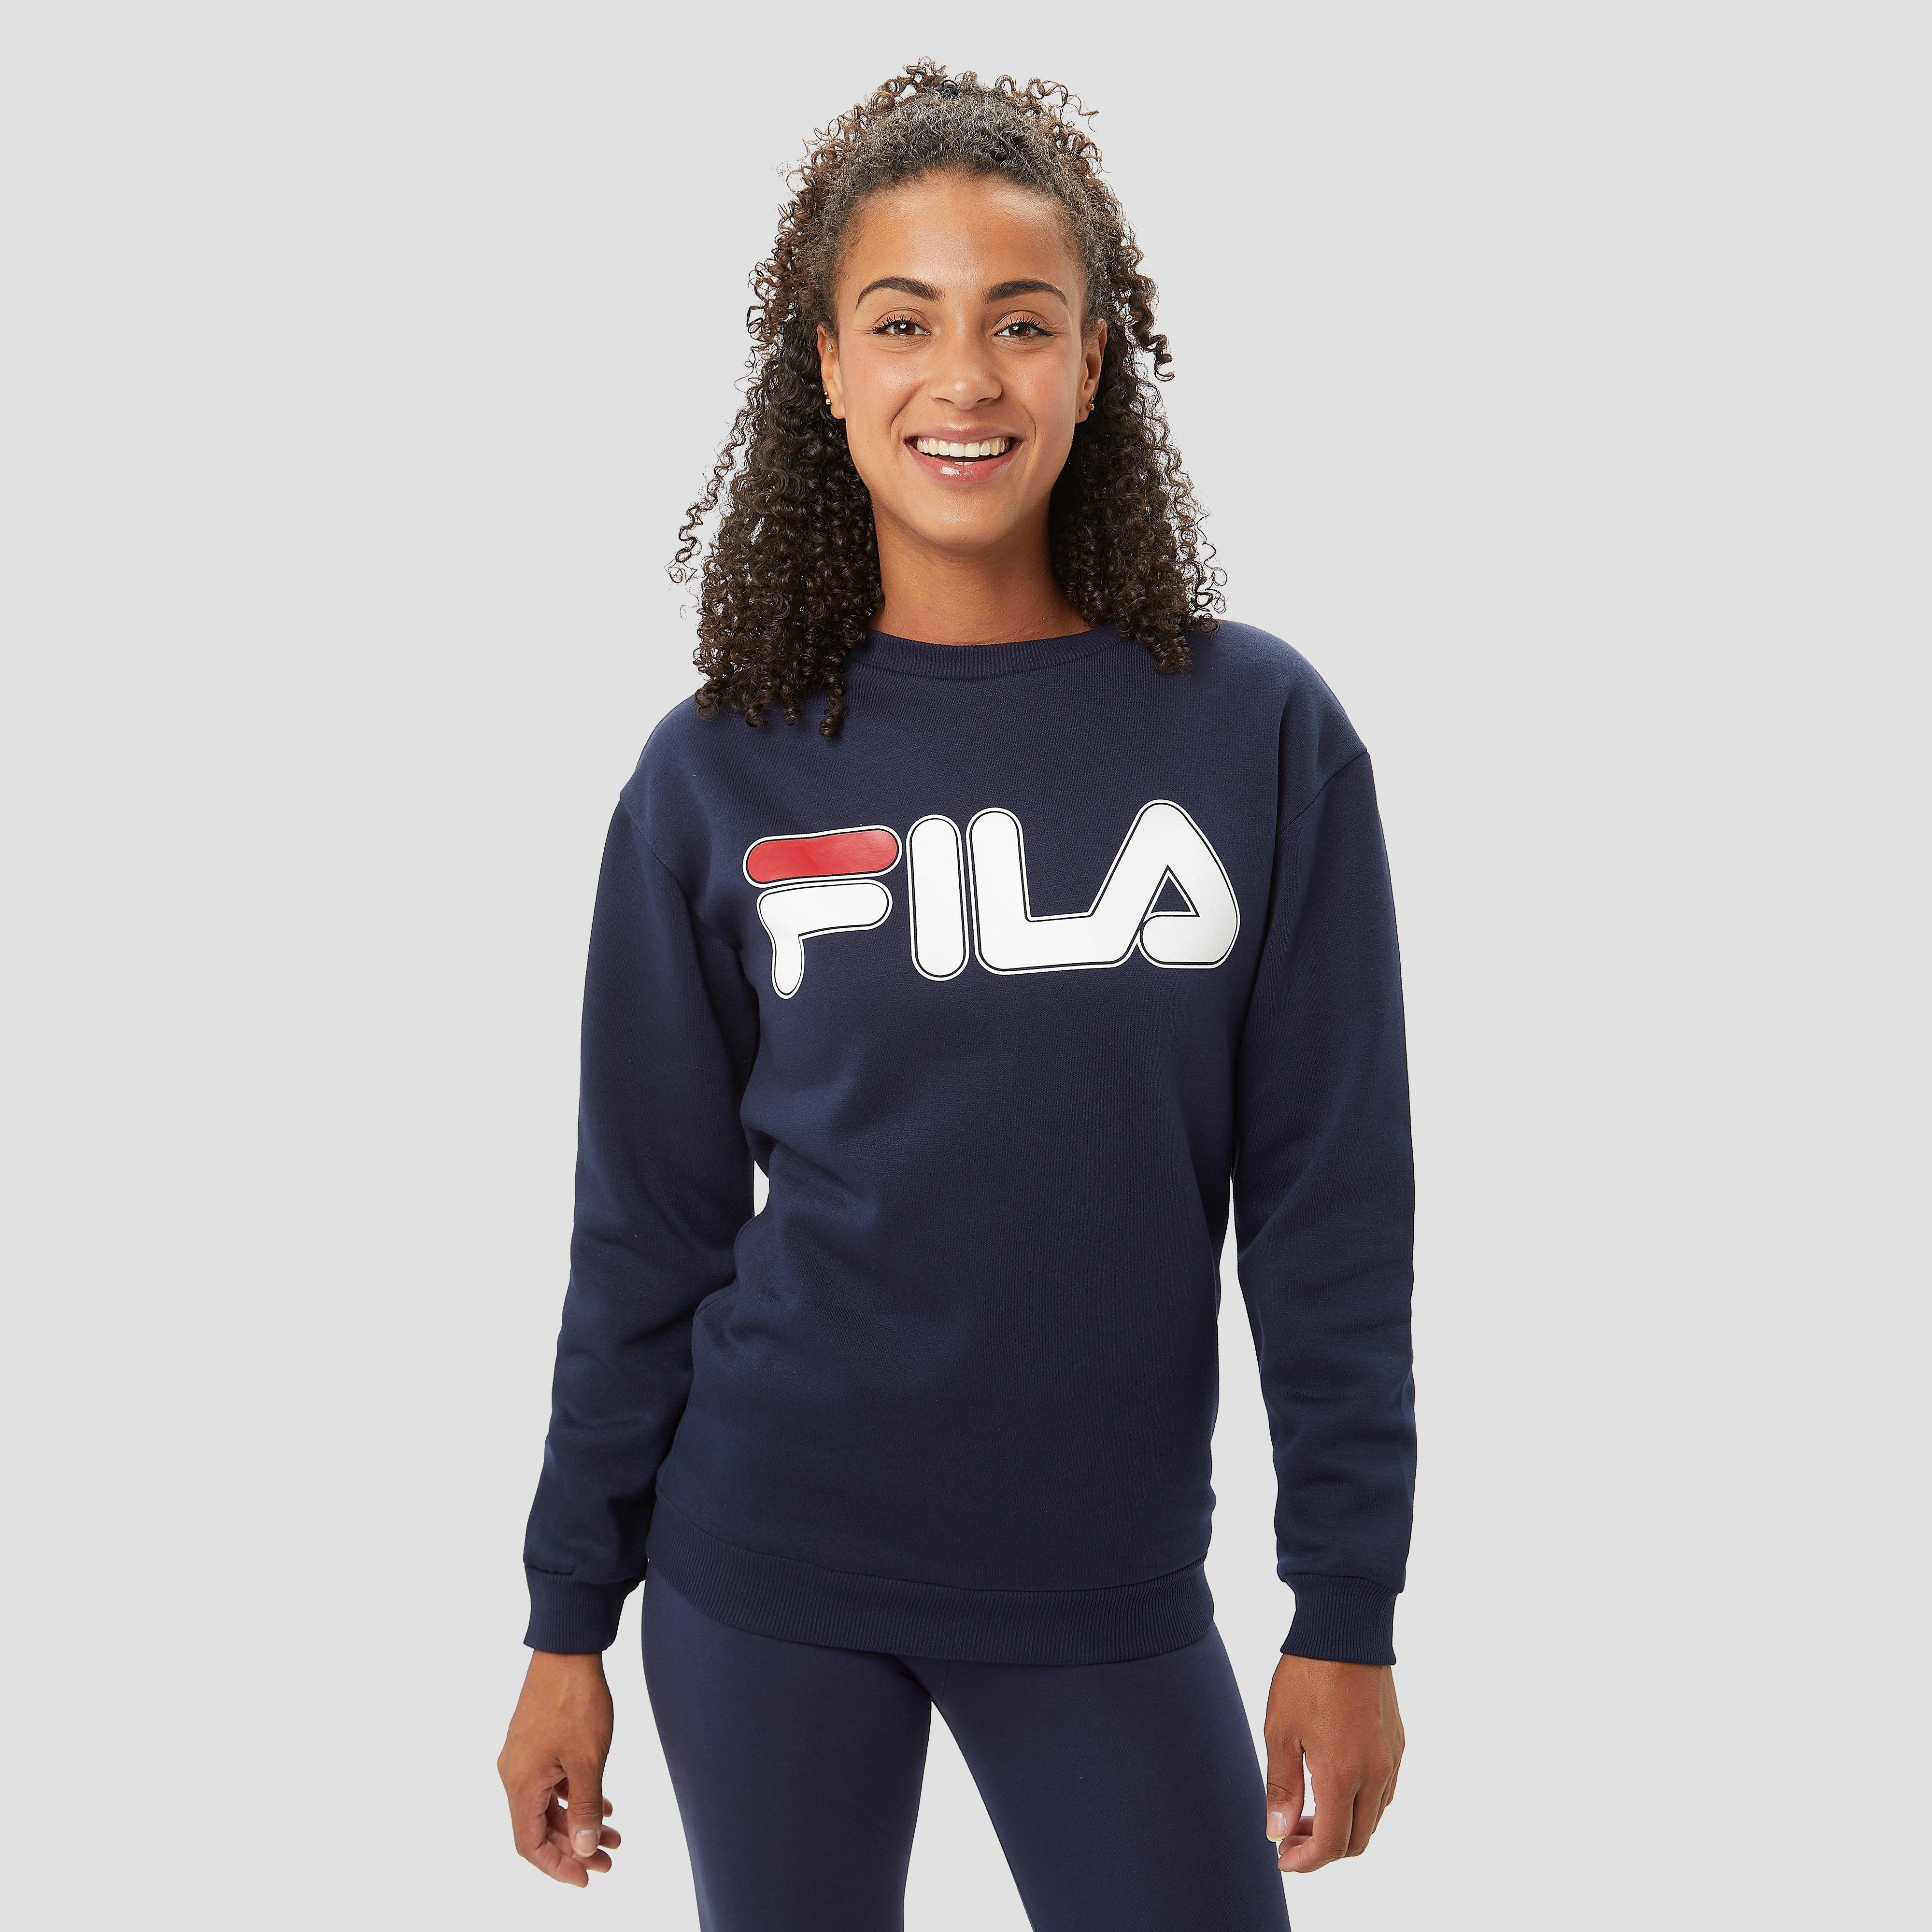 Fila crew sweater Dames Truien | KLEDING.nl